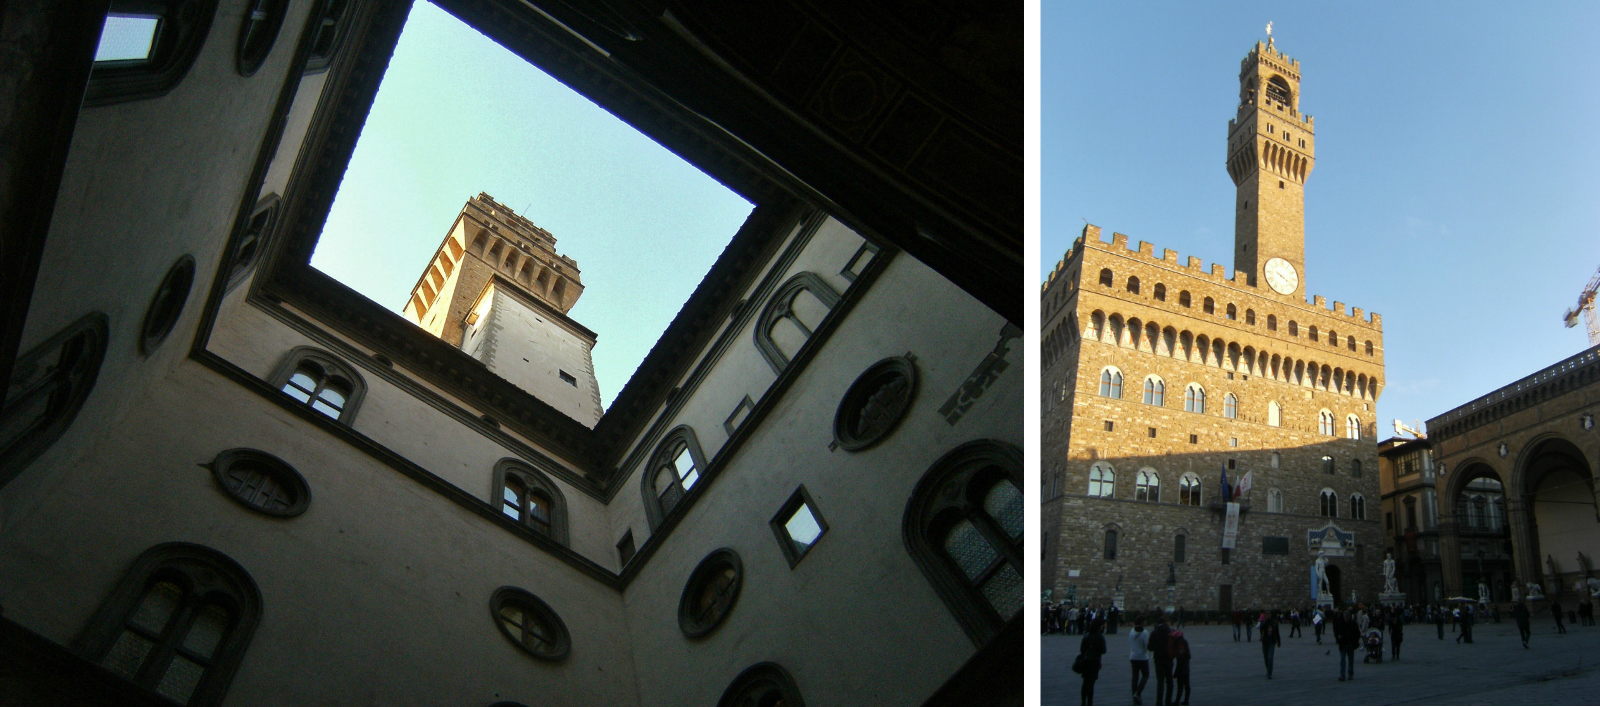 Italy - Florence - Palazzo Vecchio - 1.1